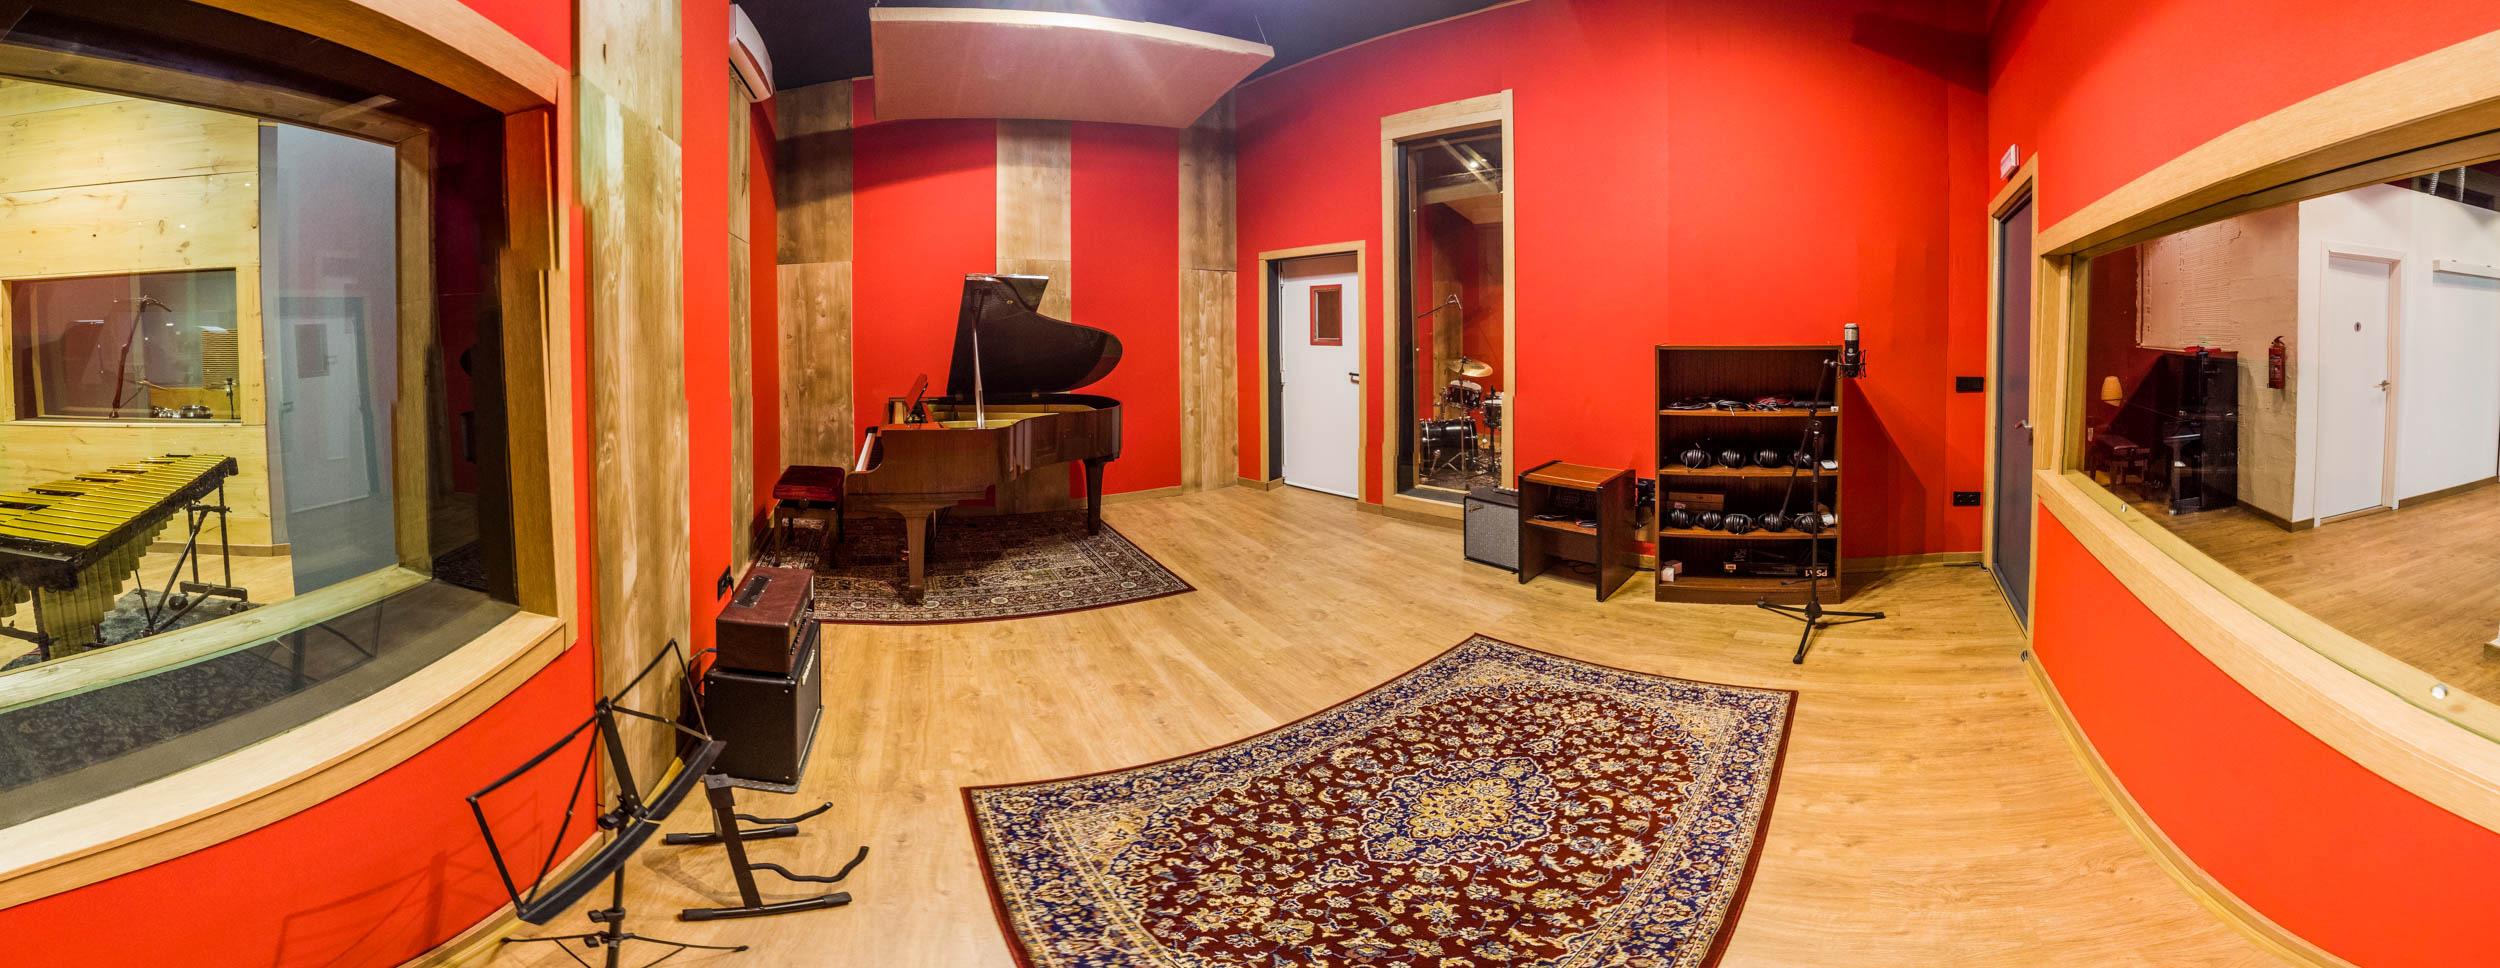 Studio-B-2-1